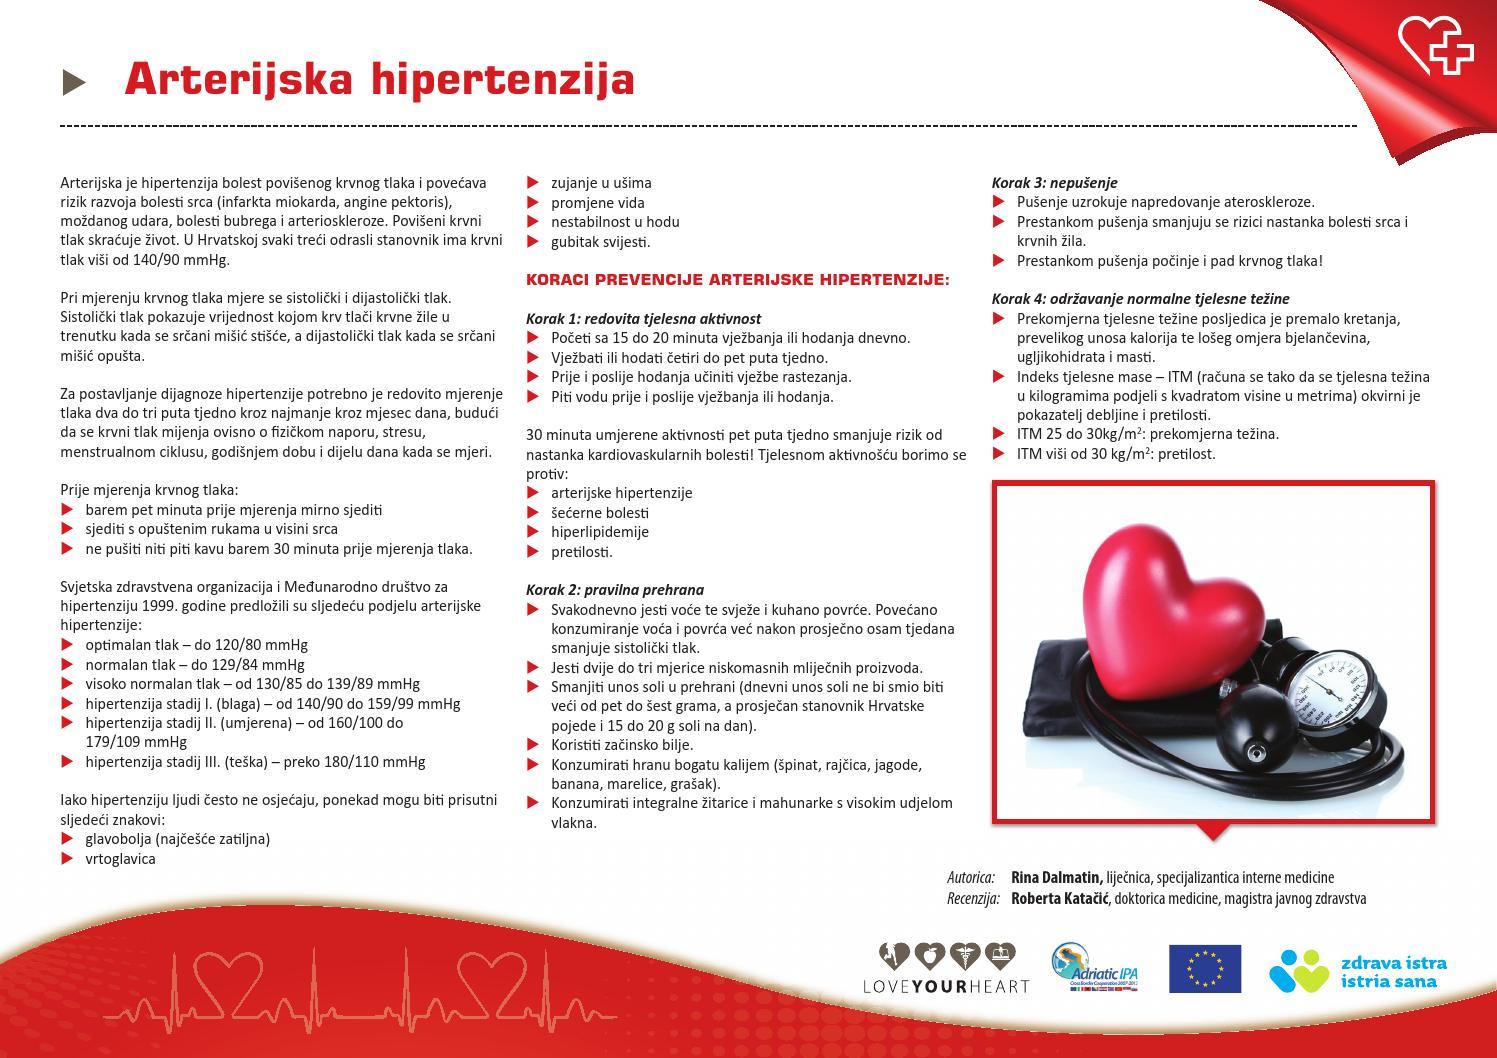 3 rizik hipertenzije 4